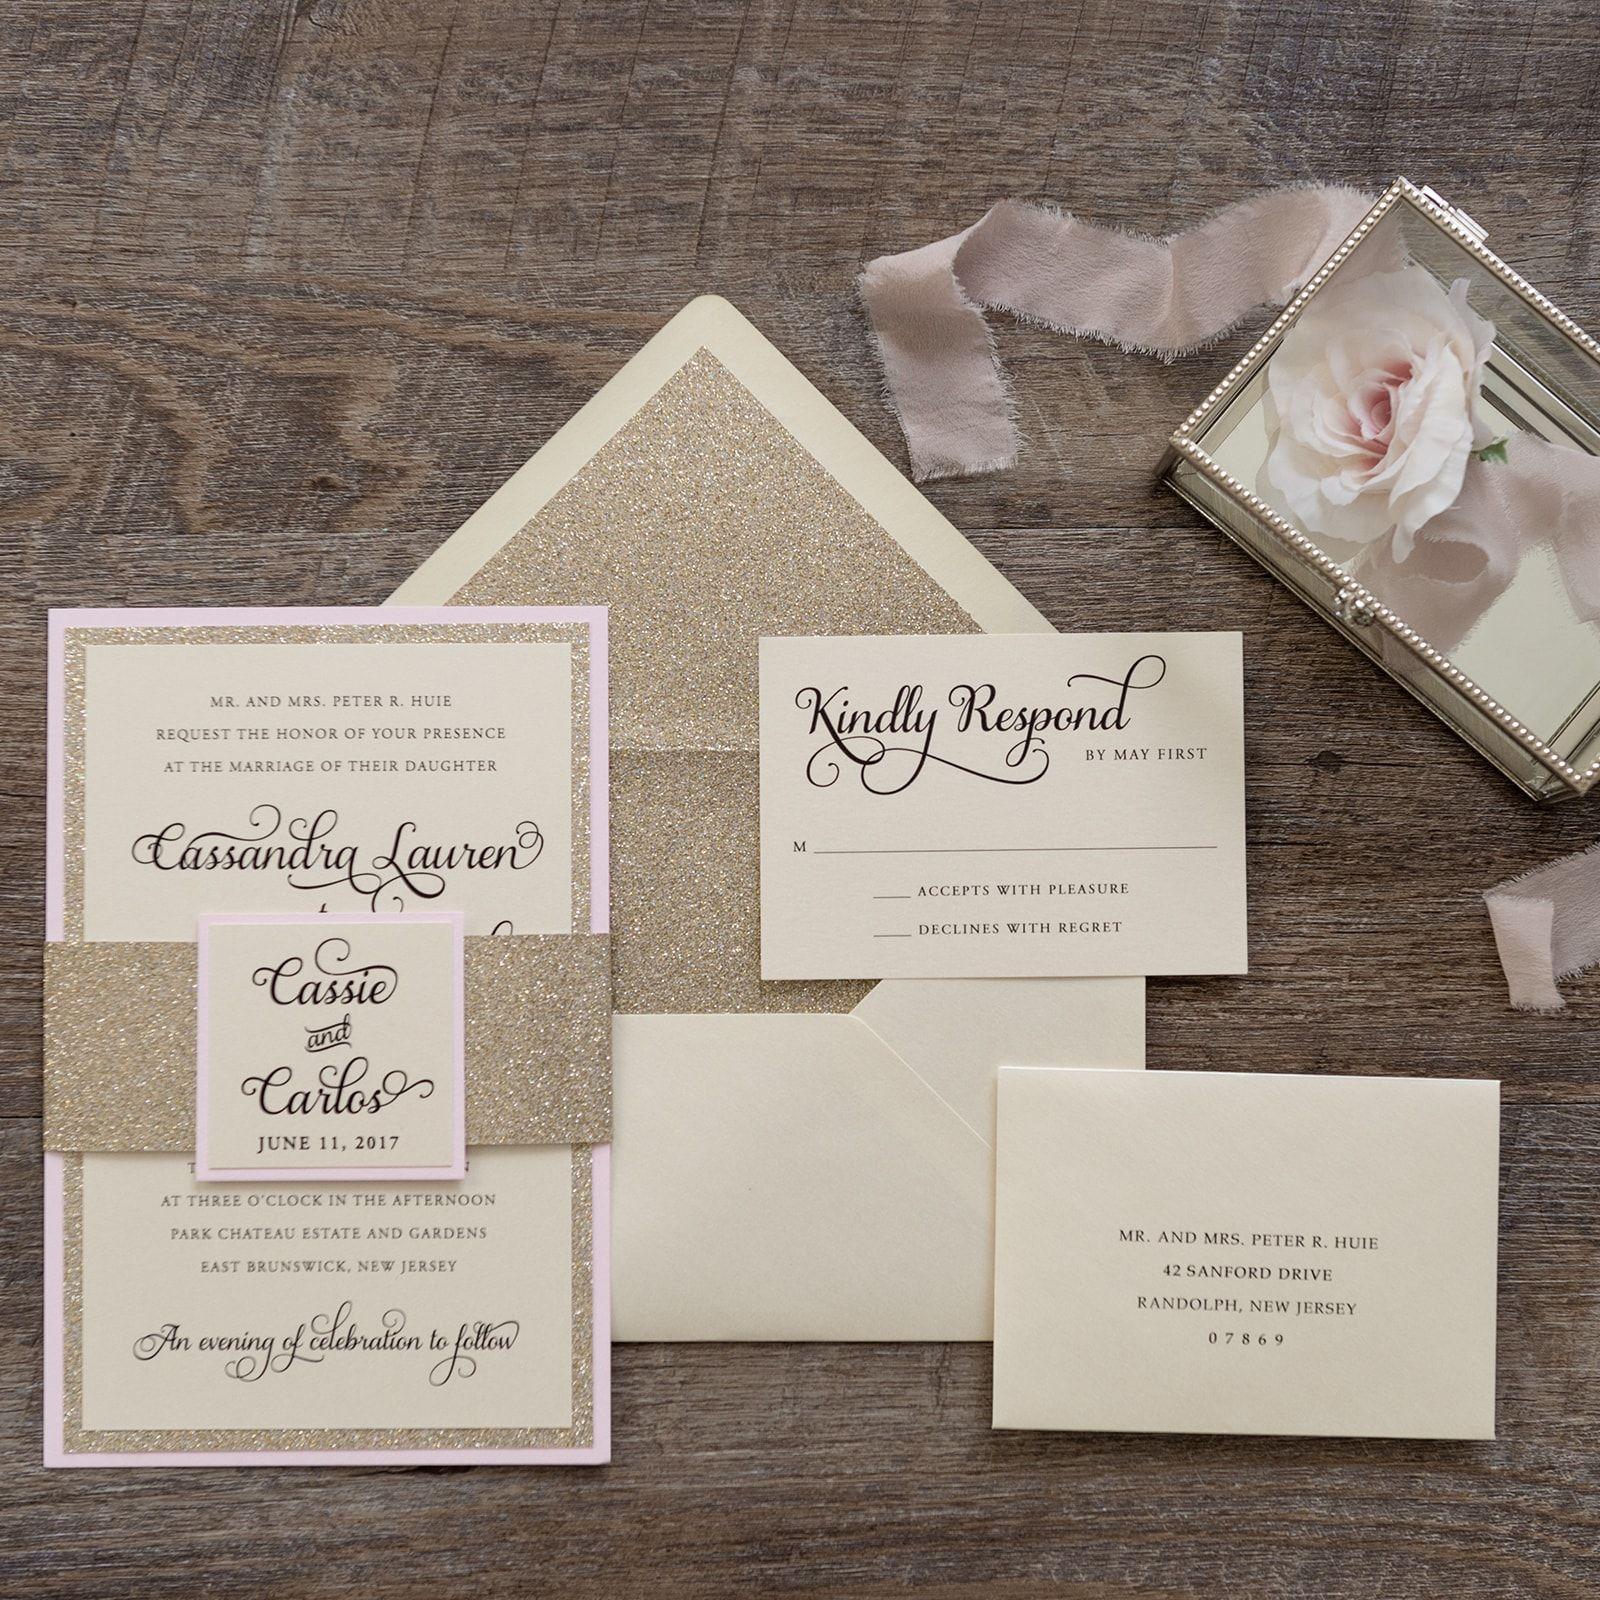 Cassie Wedding Invitation Weddings